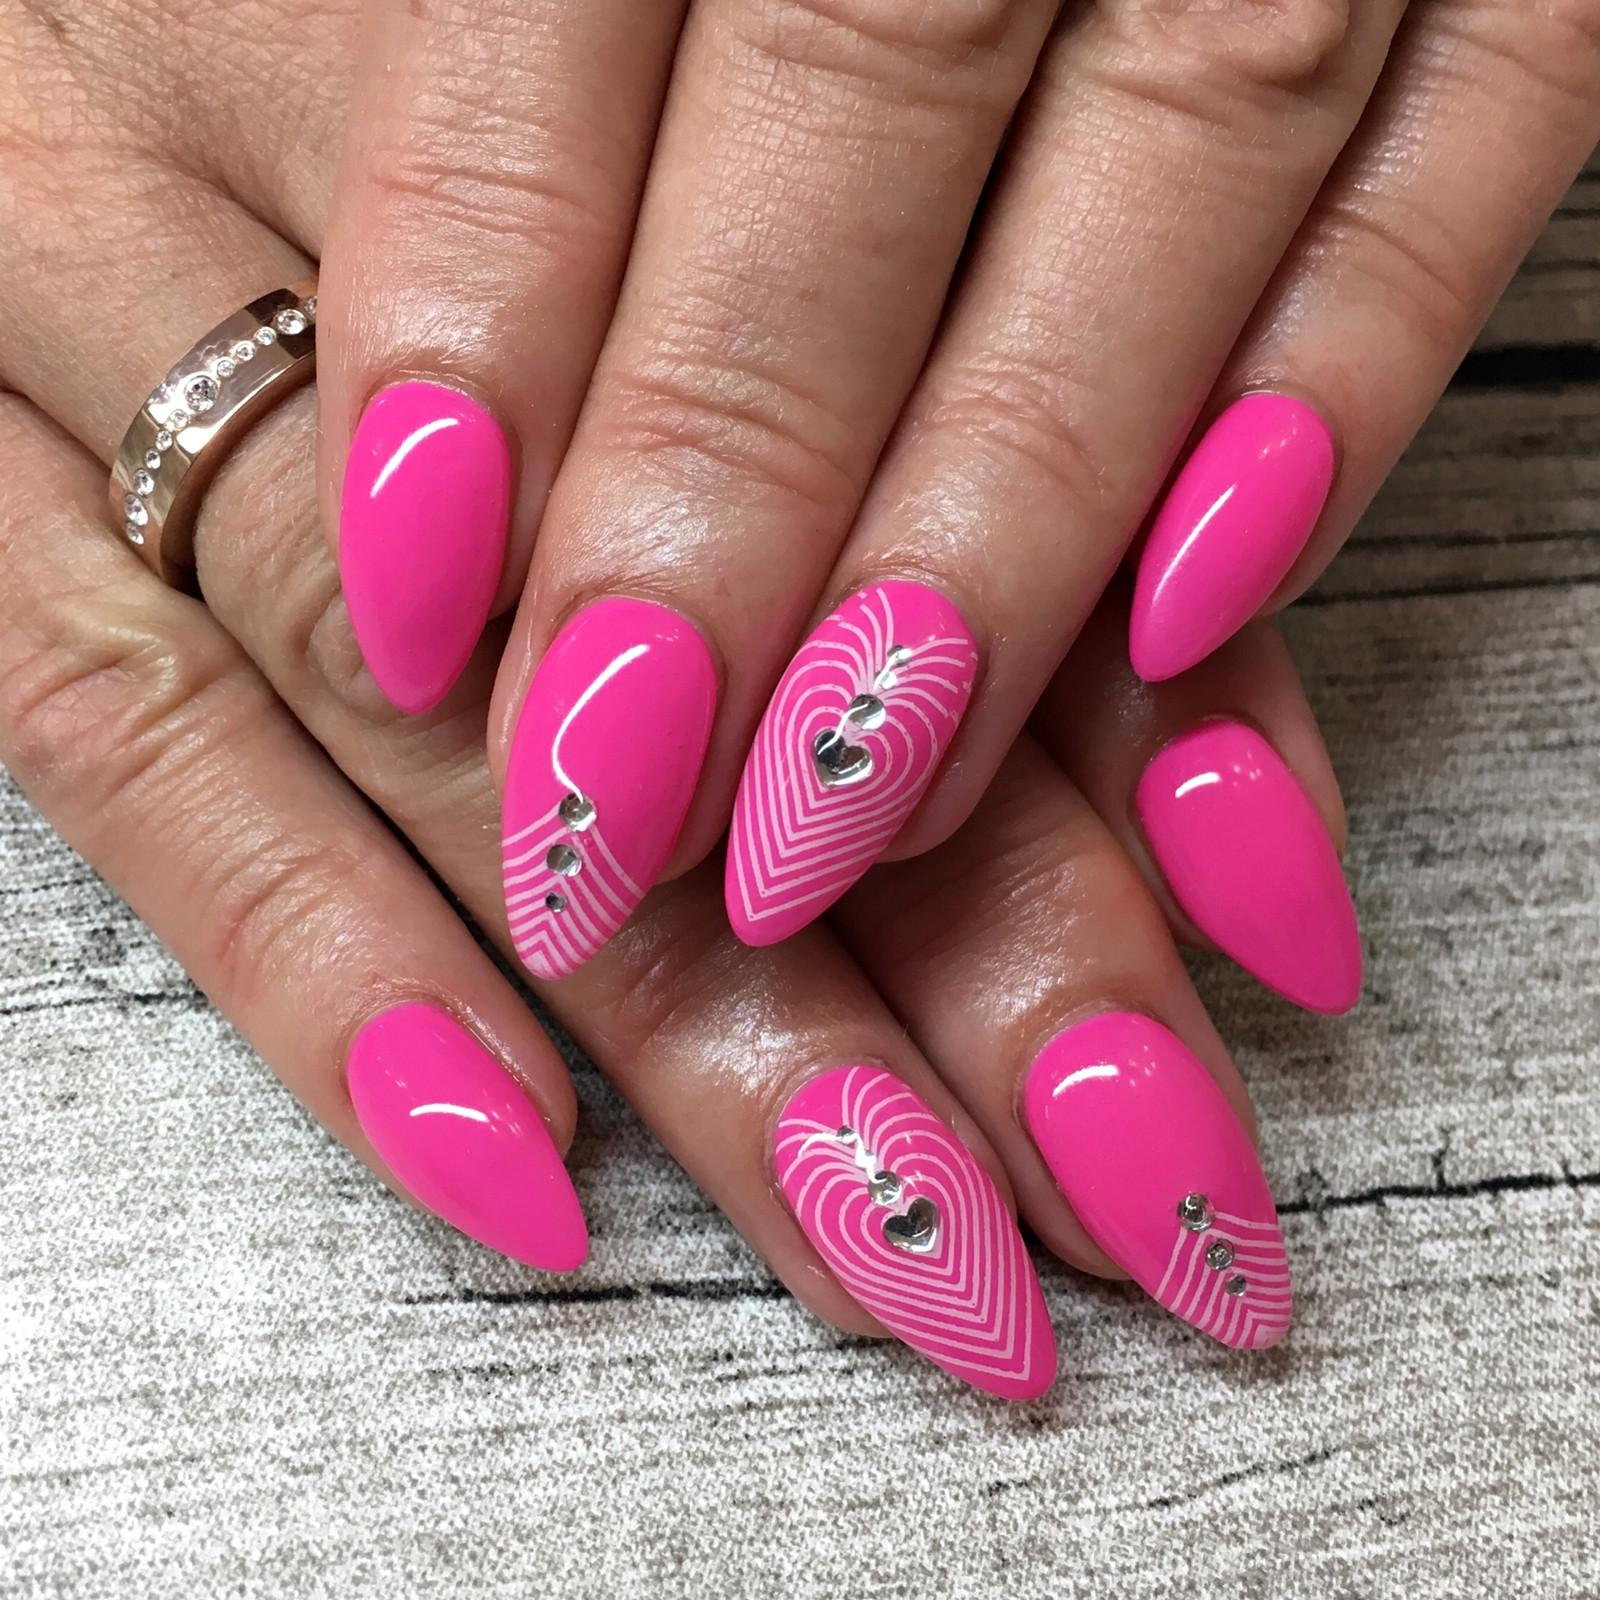 Nageldesign Sommer Neon  Nail Art Inspiration 2 Fashionladyloves